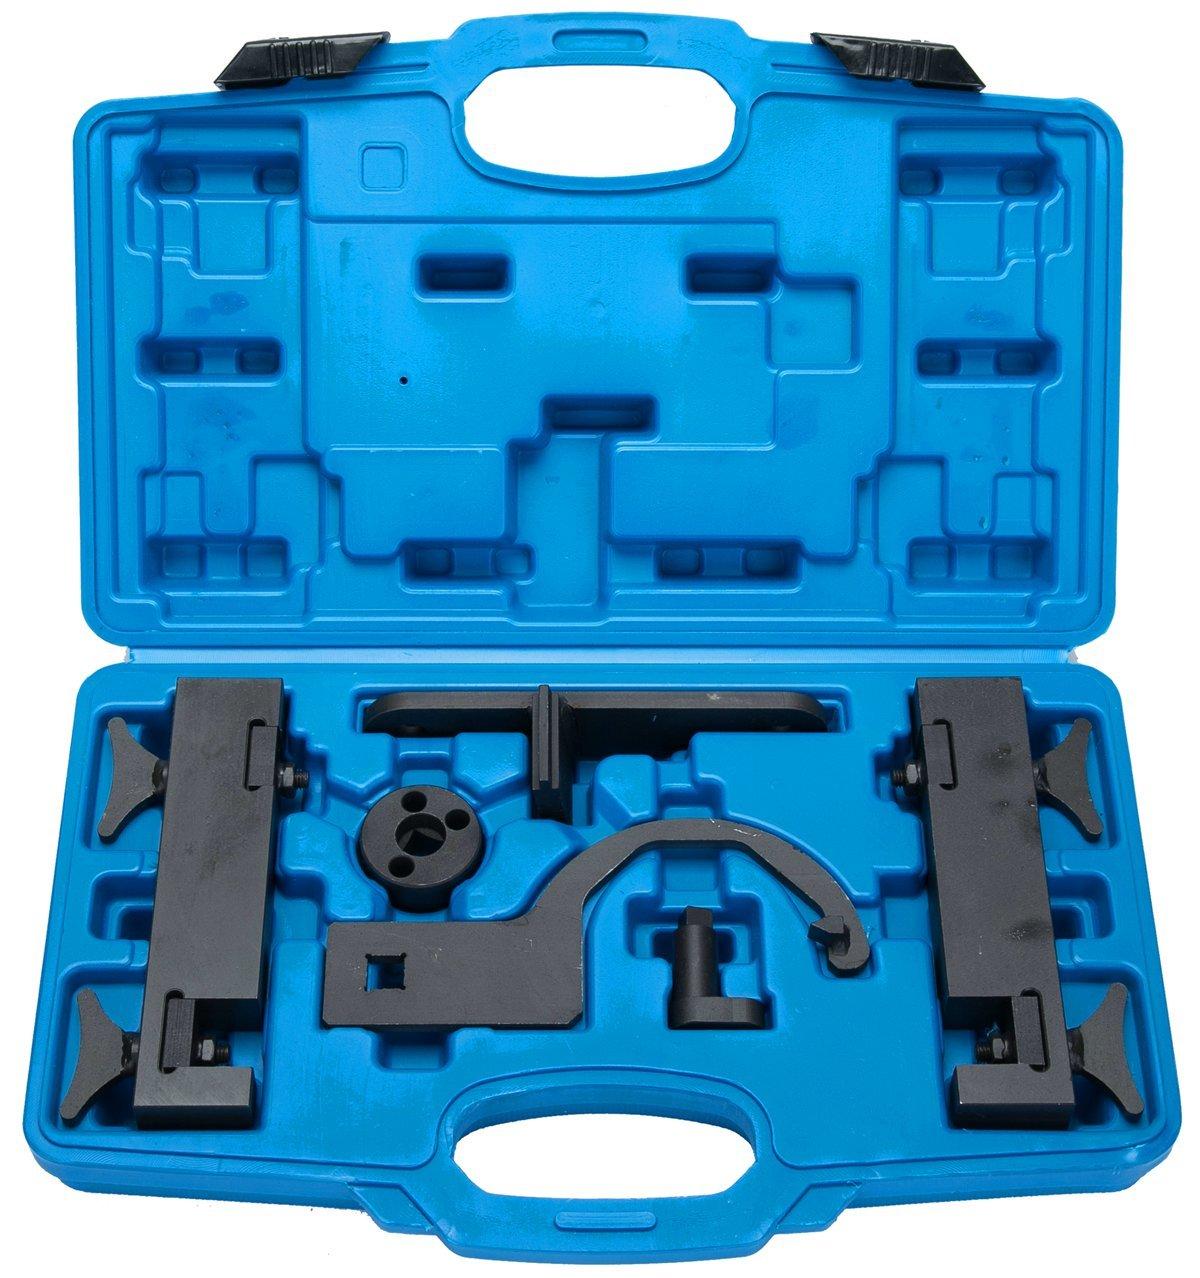 8MILELAKE Petrol Engine Timing Tools Timing Tool Camshaft Alignment Compatible for Jaguar Land Rover (V8) 5.0L